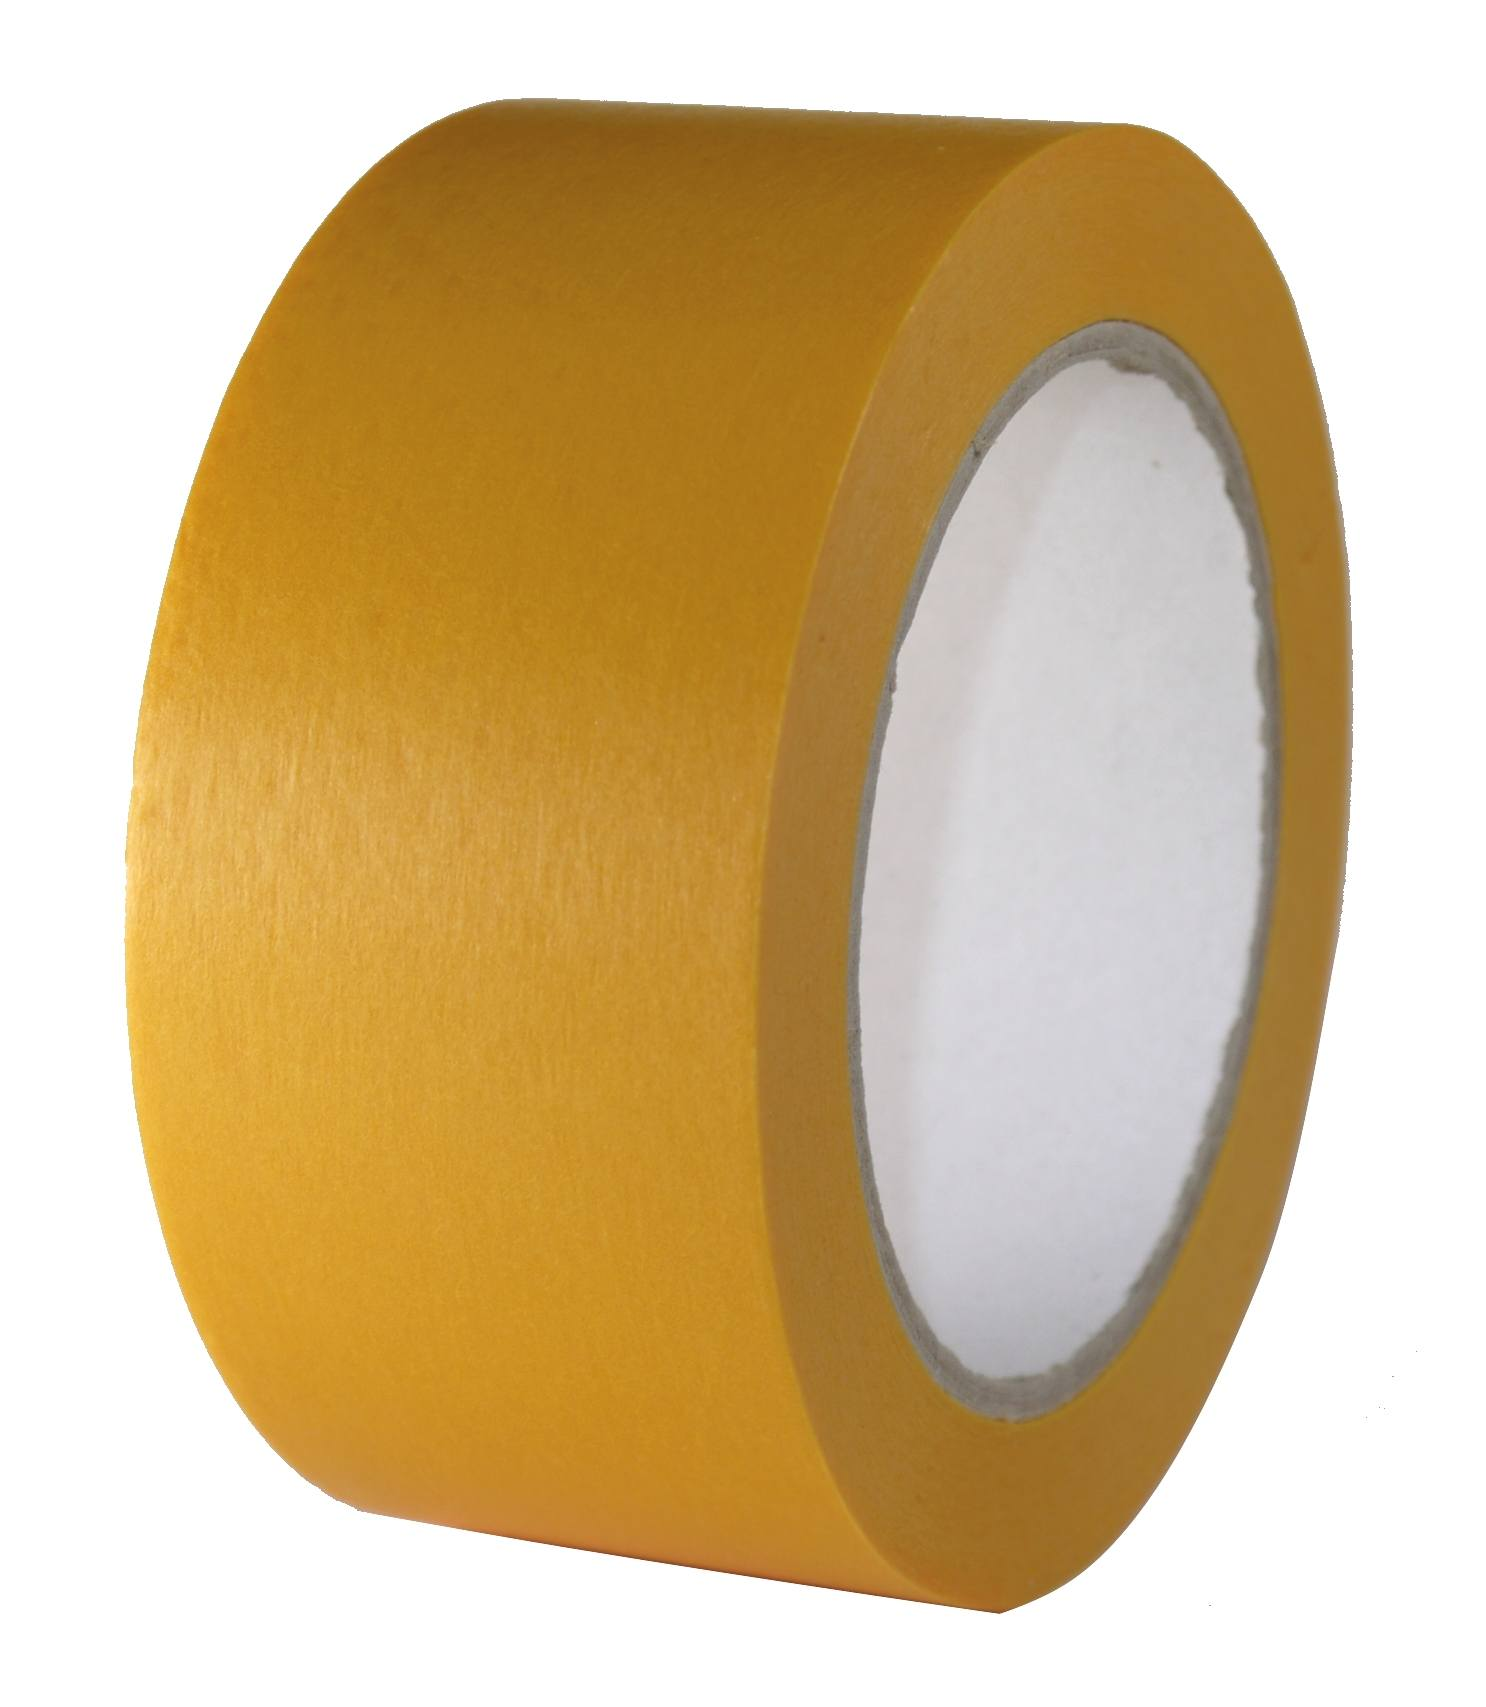 Lackierband Universal Gold/Orange 50mm/50m bis 100°C